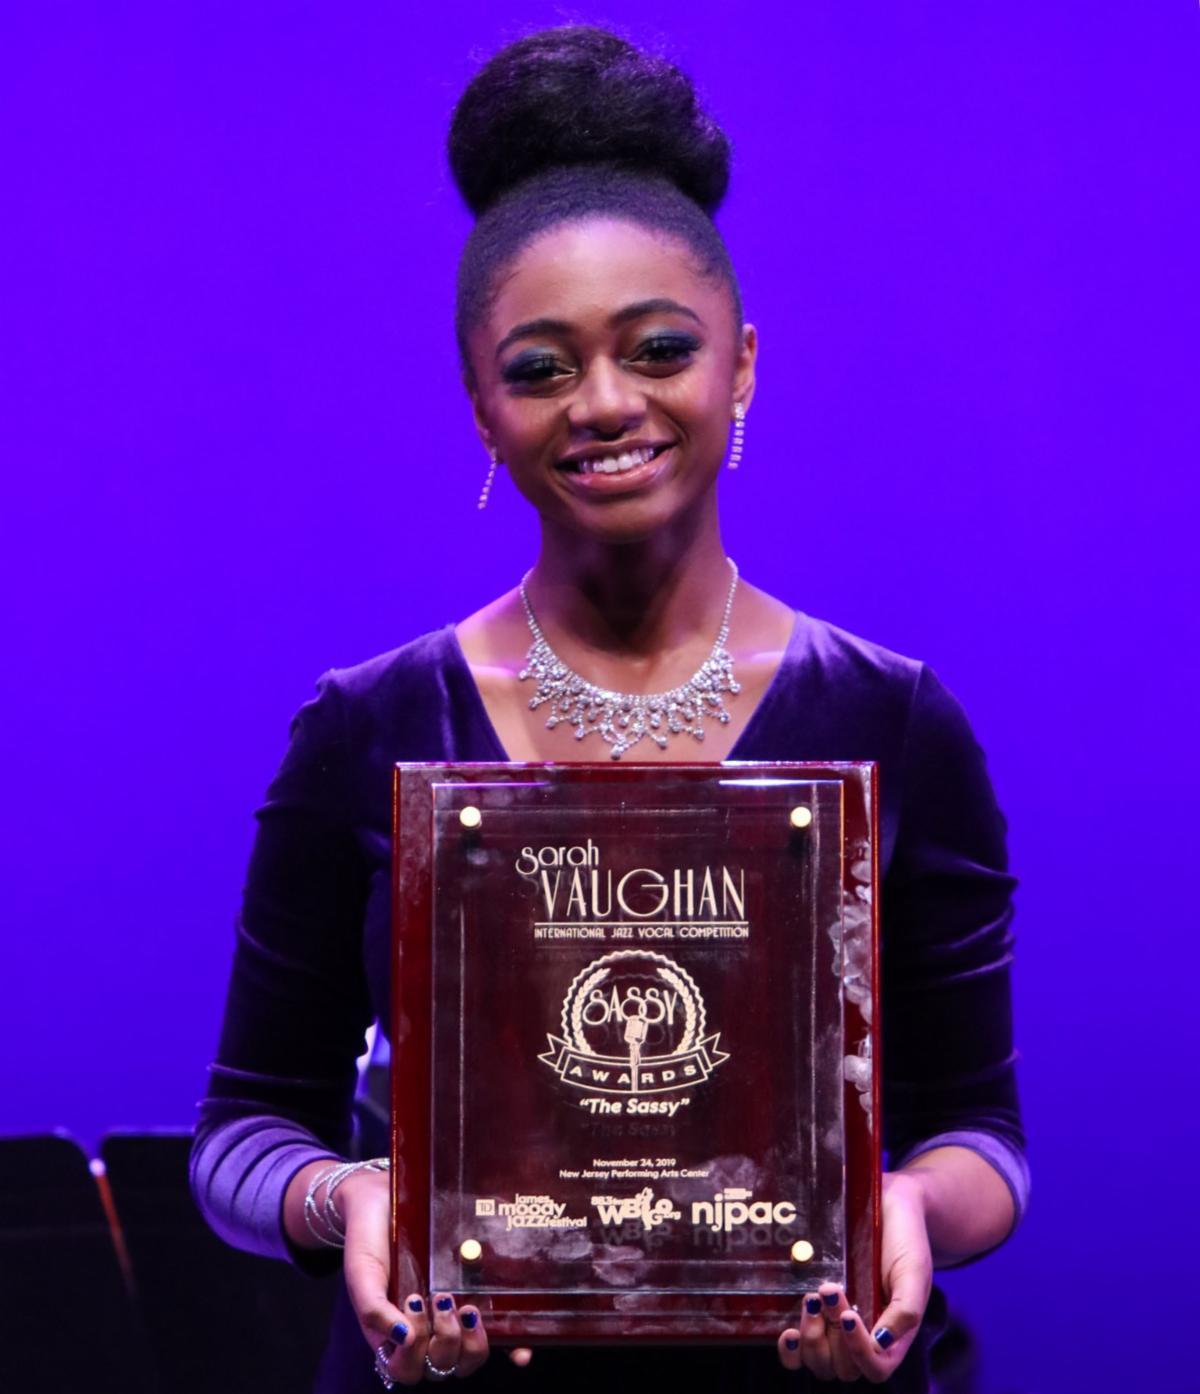 Samara McLendon, winner of the 2019 Sarah Vaughan International Jazz Vocal Competition